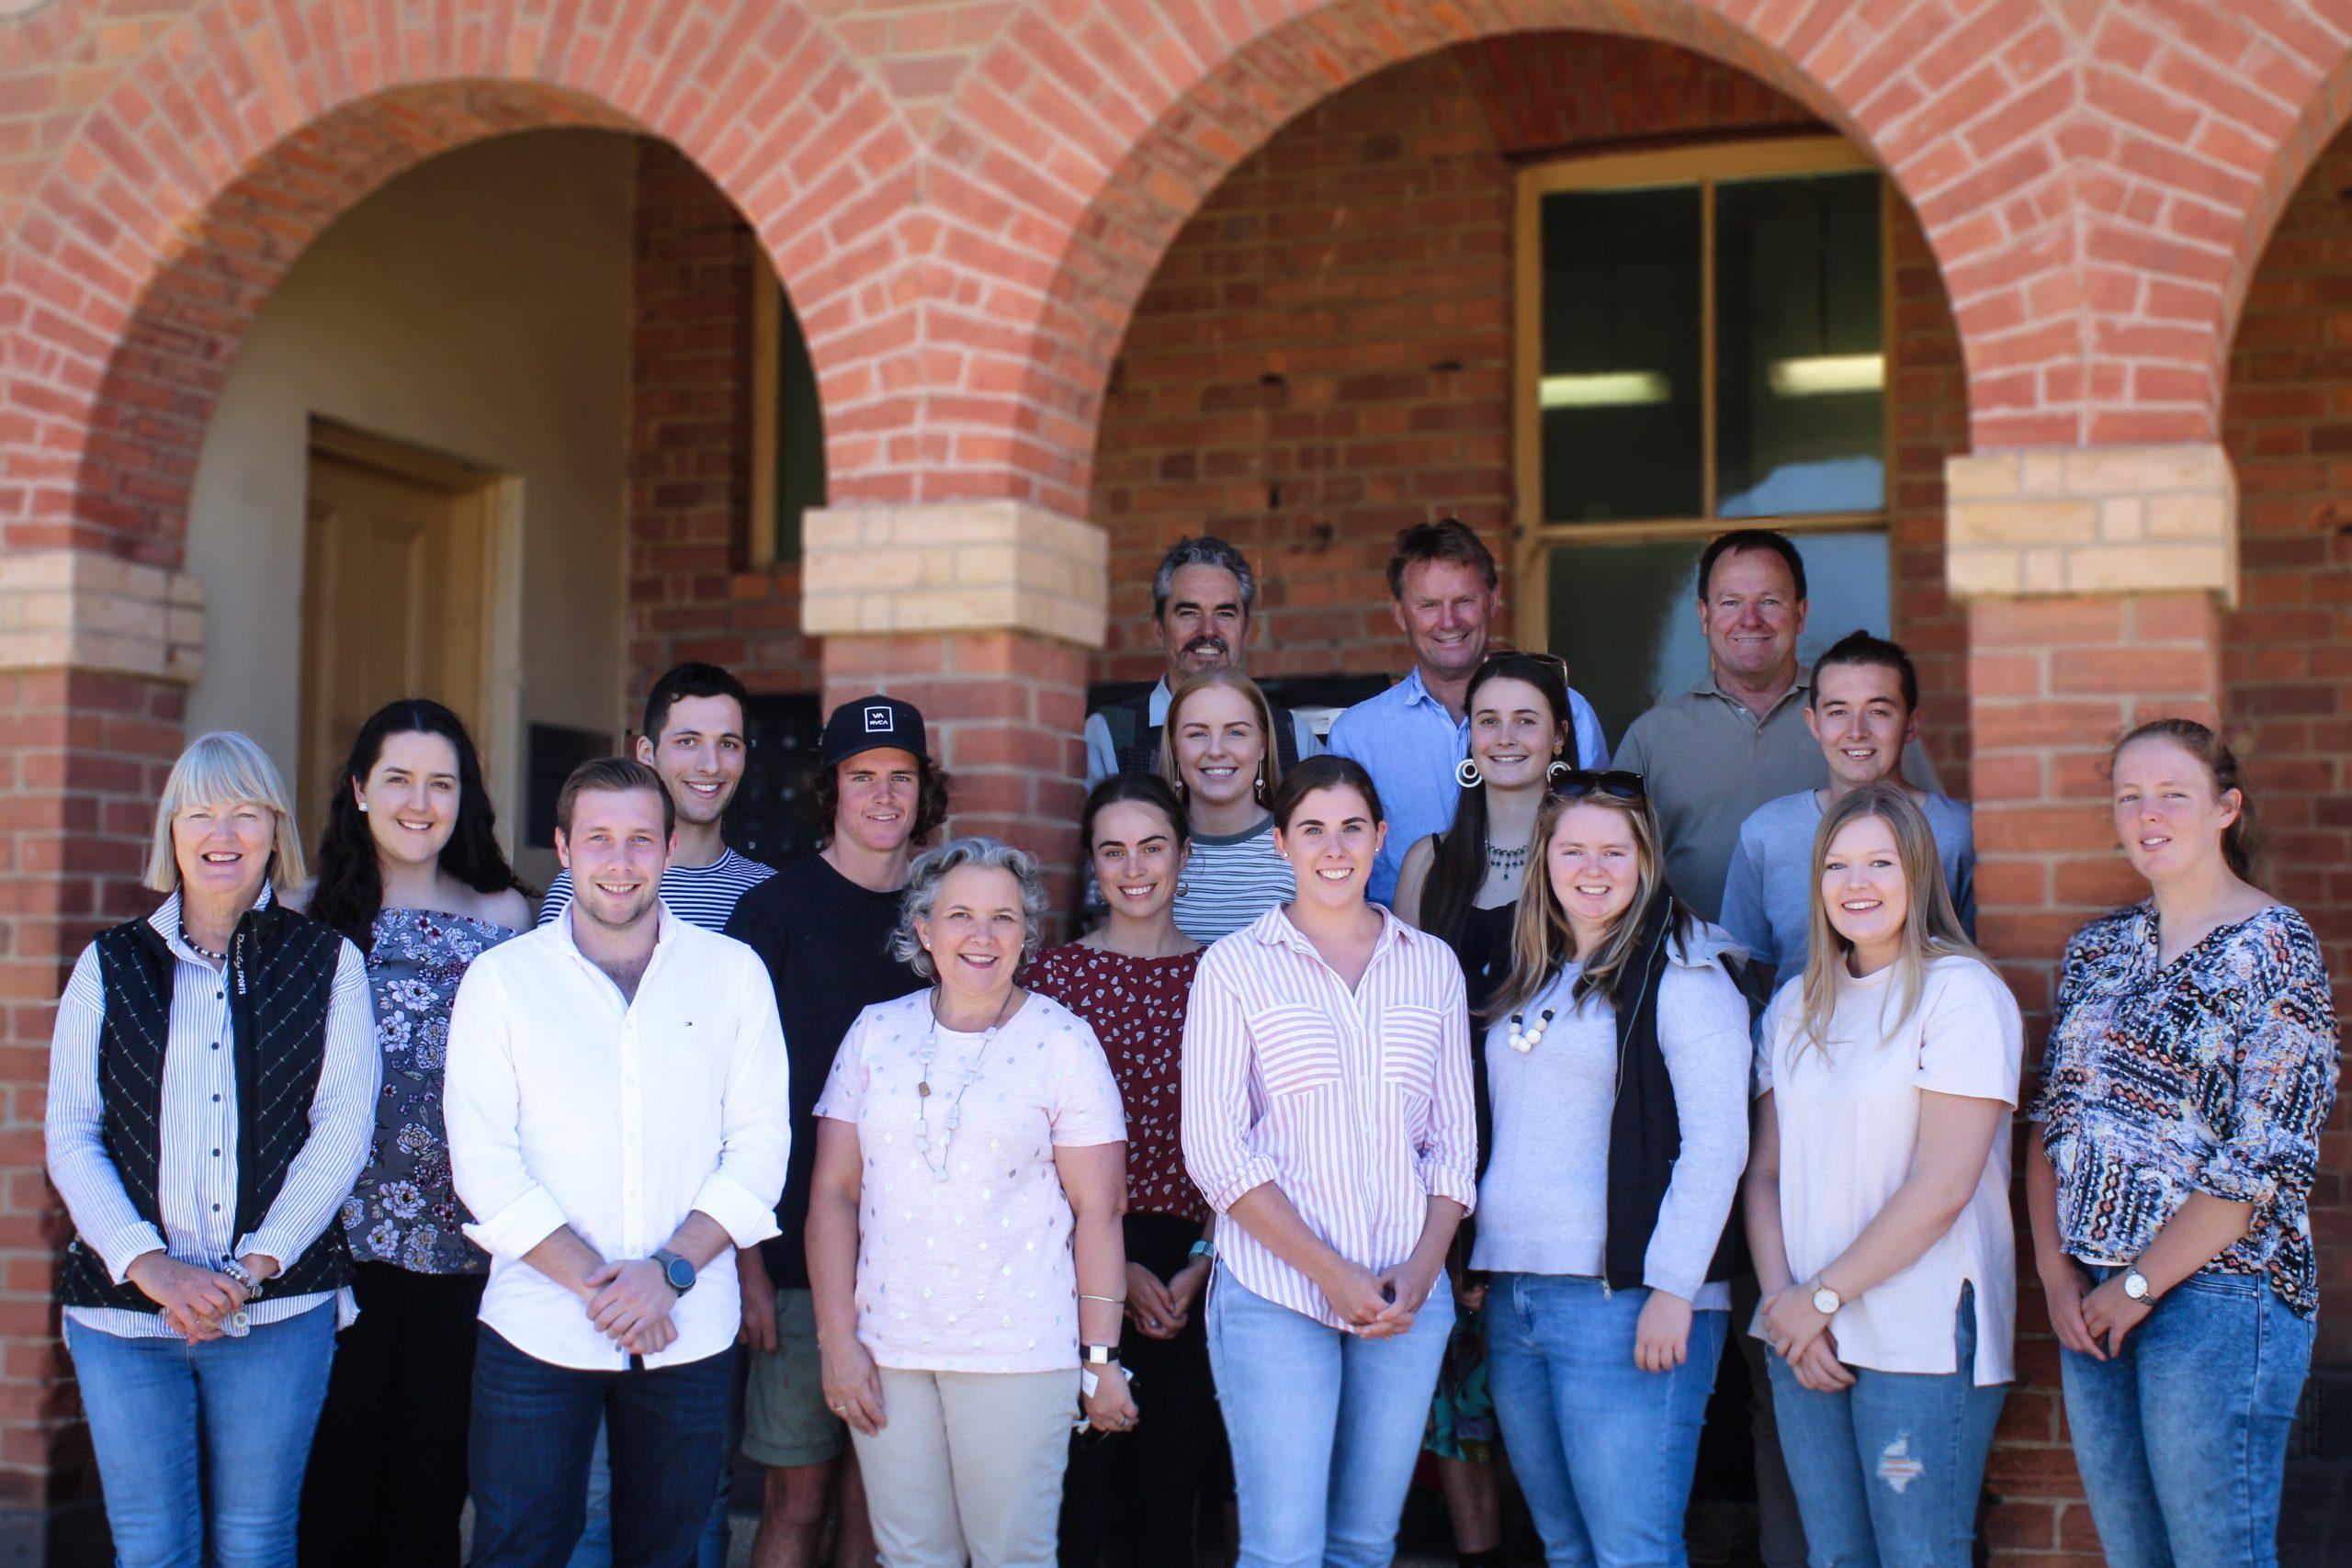 2015 Youthrive Victoria (MSRF) scholars